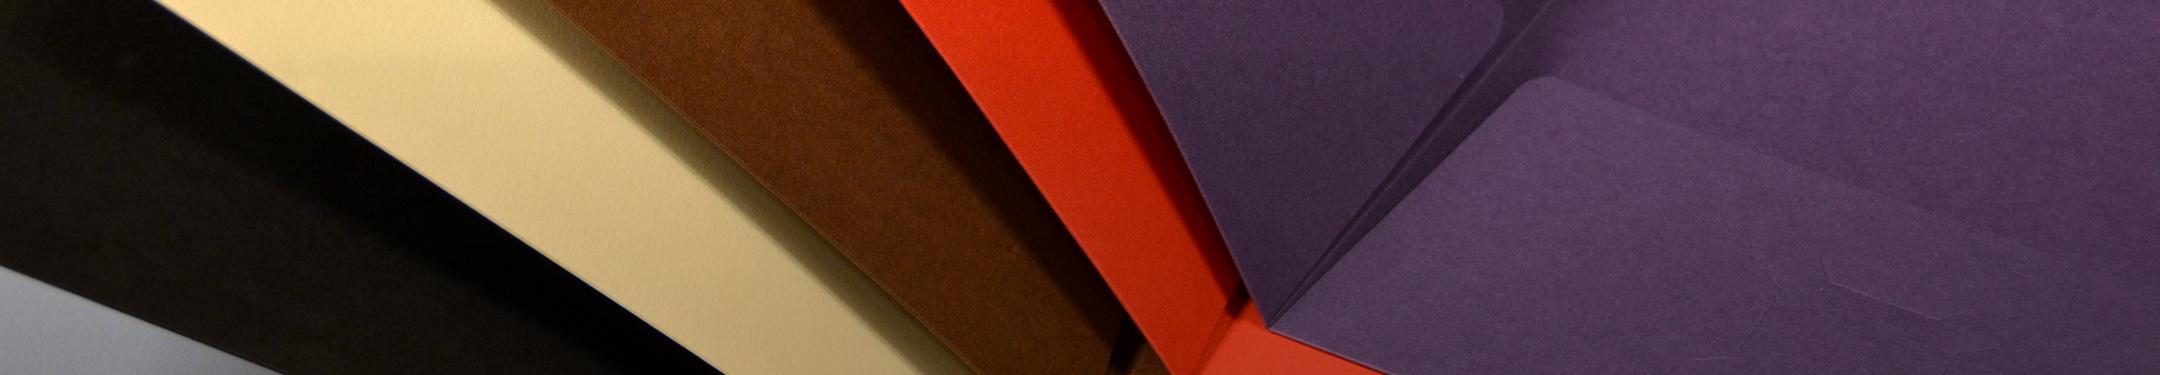 JAZZ Presentation Folders